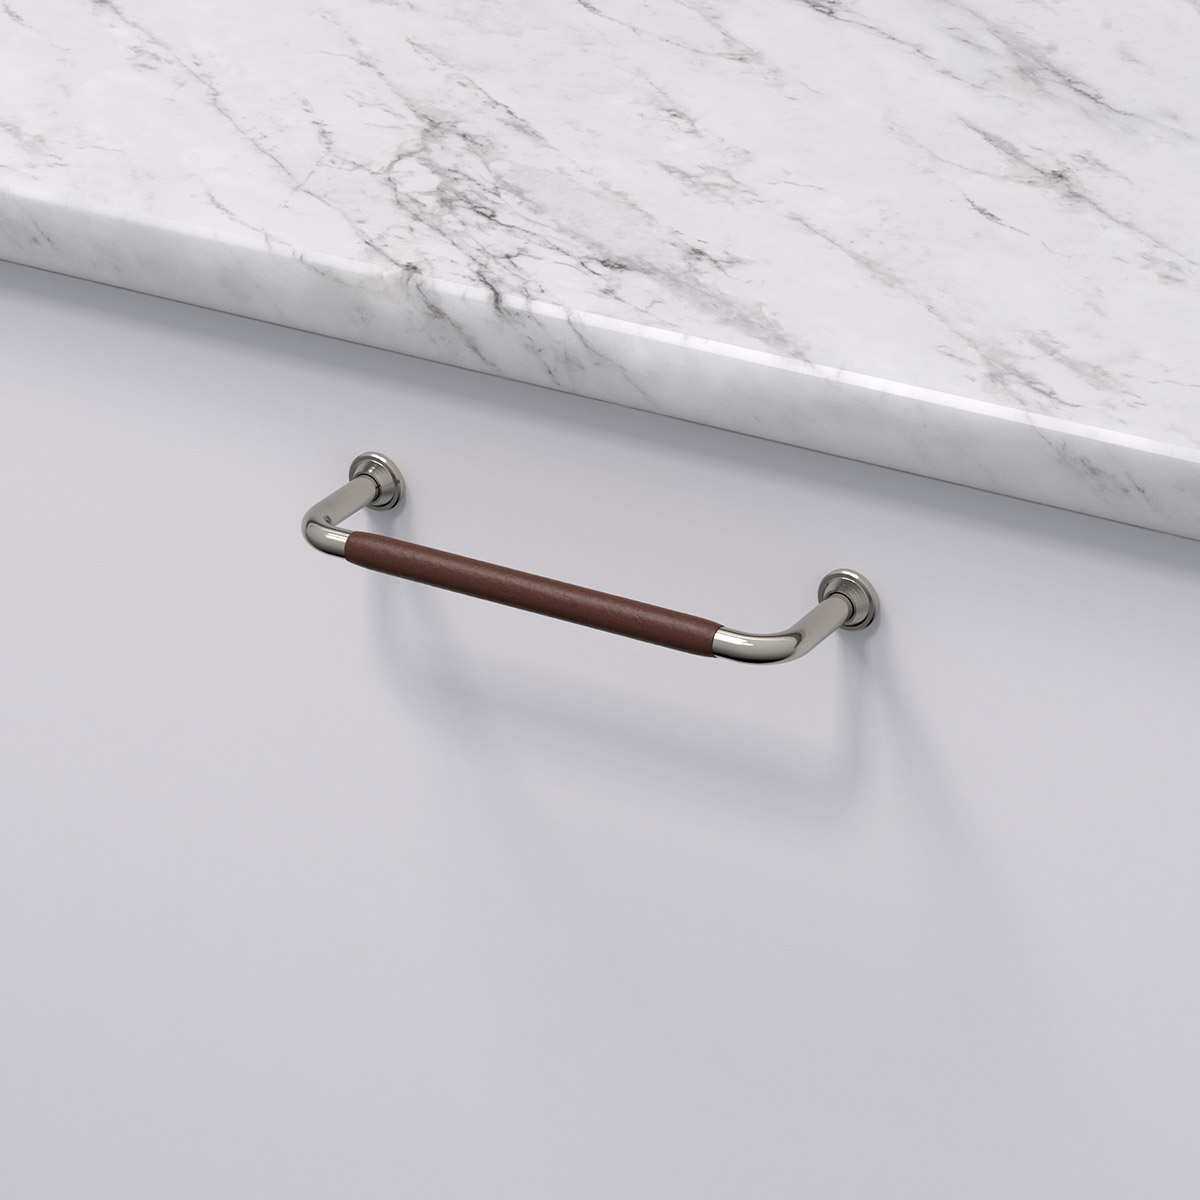 Handtag 1353 ladersvept fornicklad brun 330741 11 cc 128 mm ncs s 0300 n marmor carrara